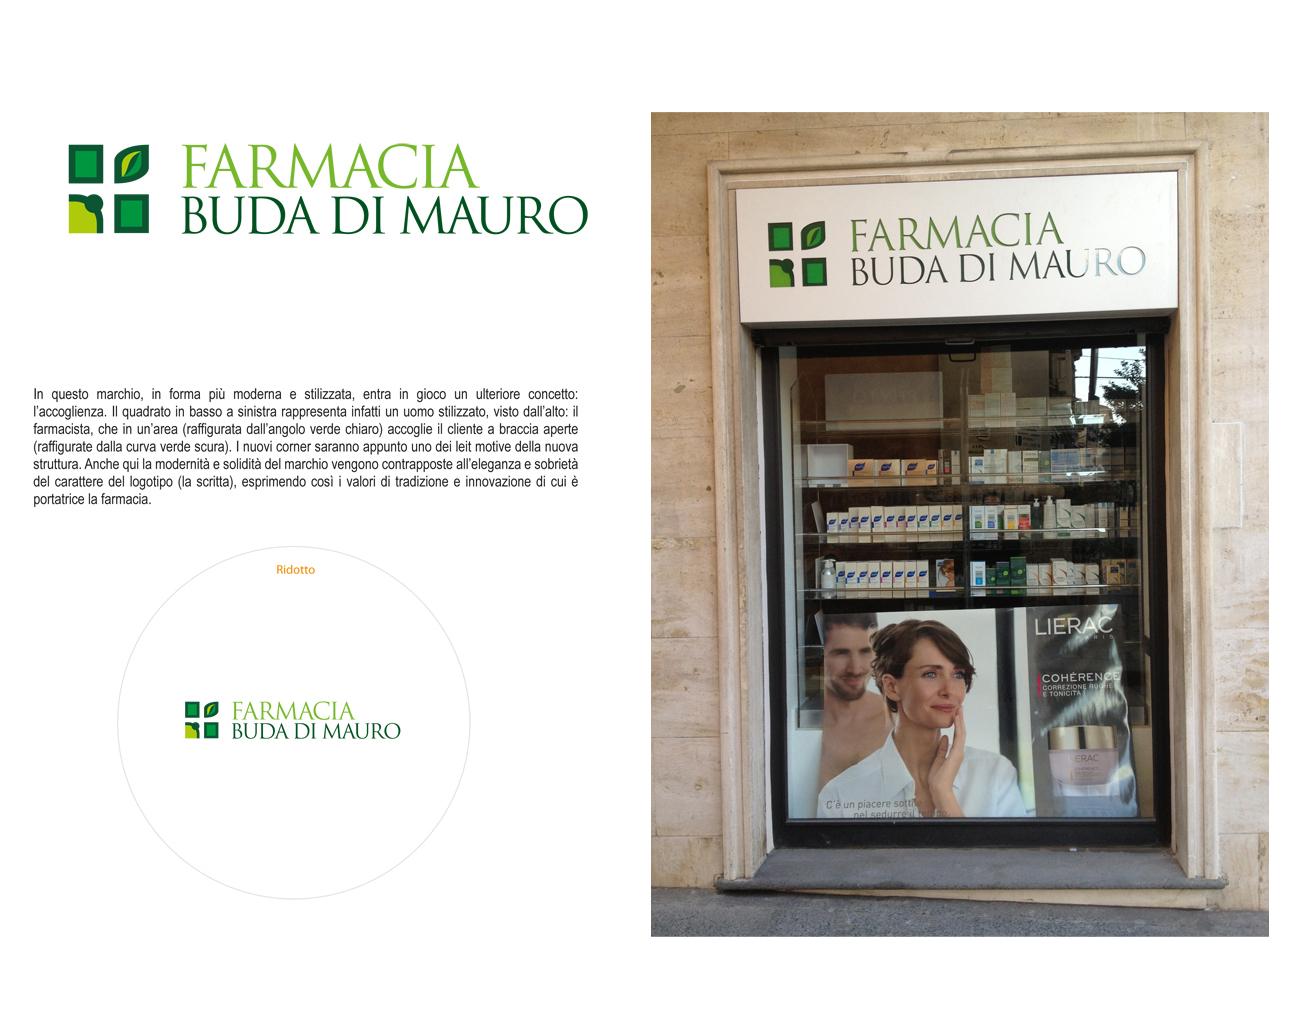 FarmaciaBuda_Marchio